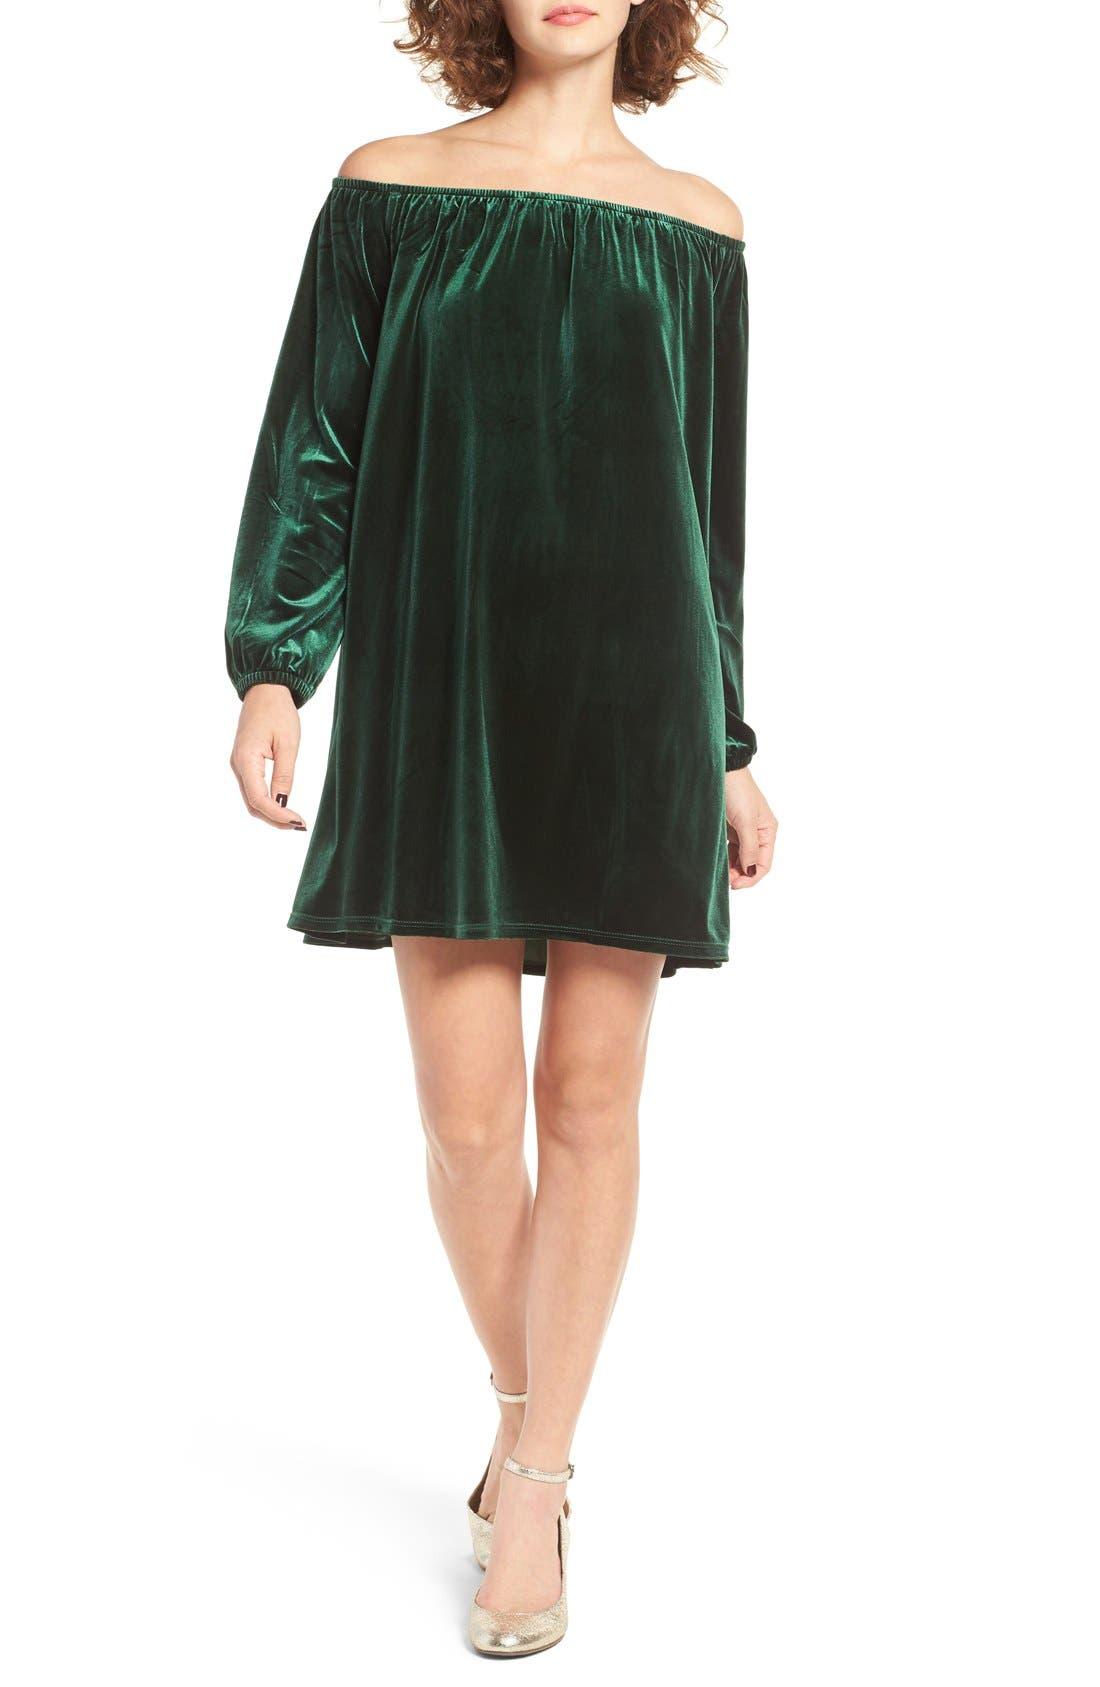 Main Image - One Clothing Off the Shoulder Velvet Swing Dress